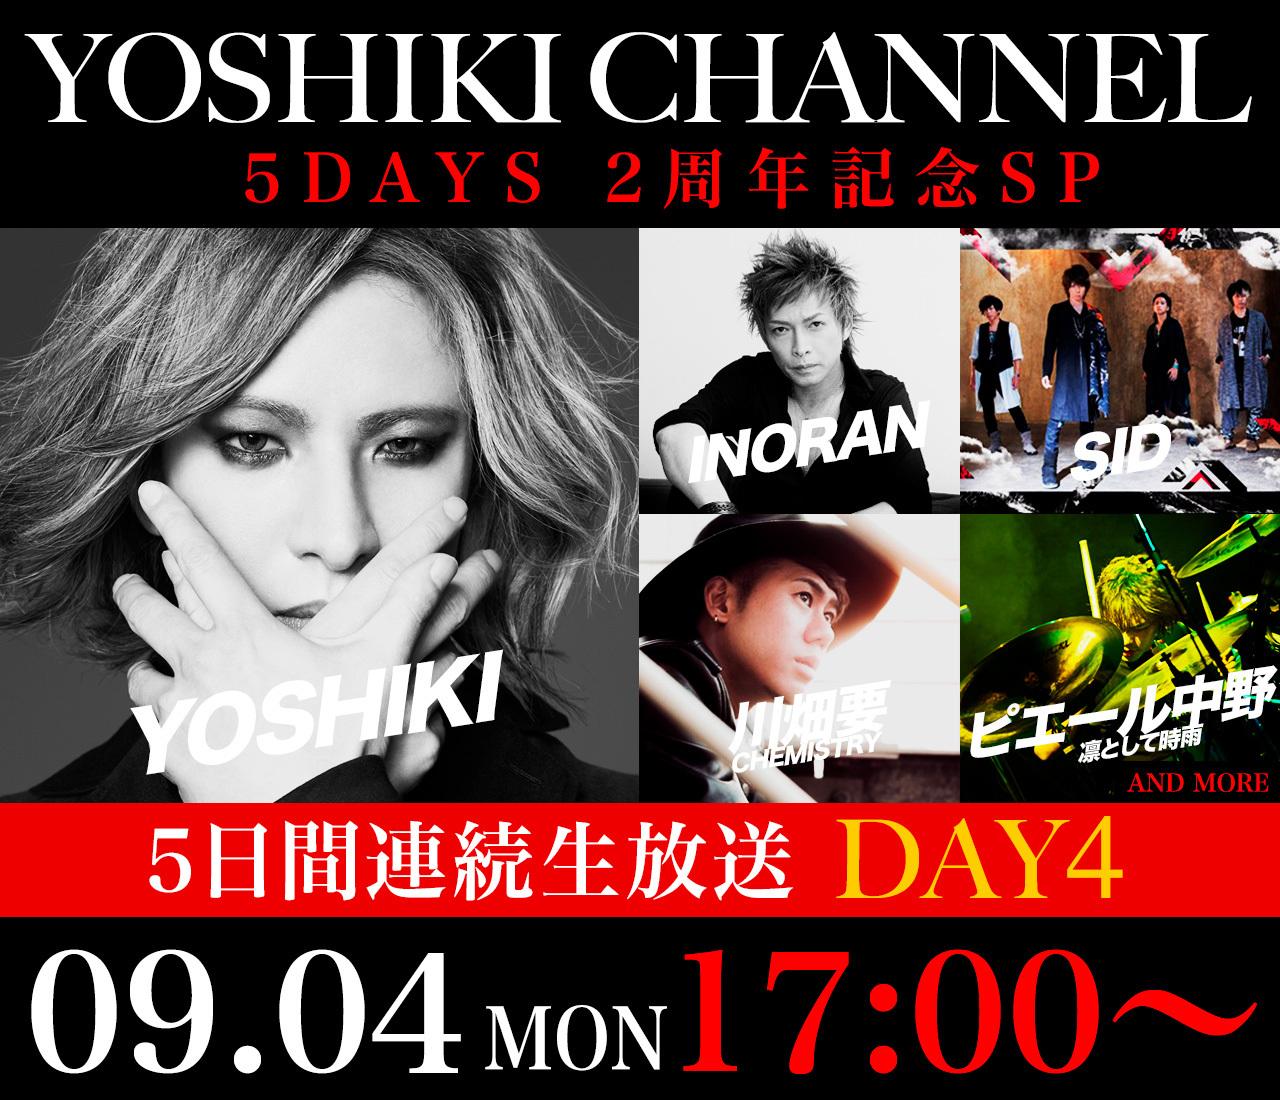 YOSHIKI CHANNEL『5DAYS 2周年記念SP』